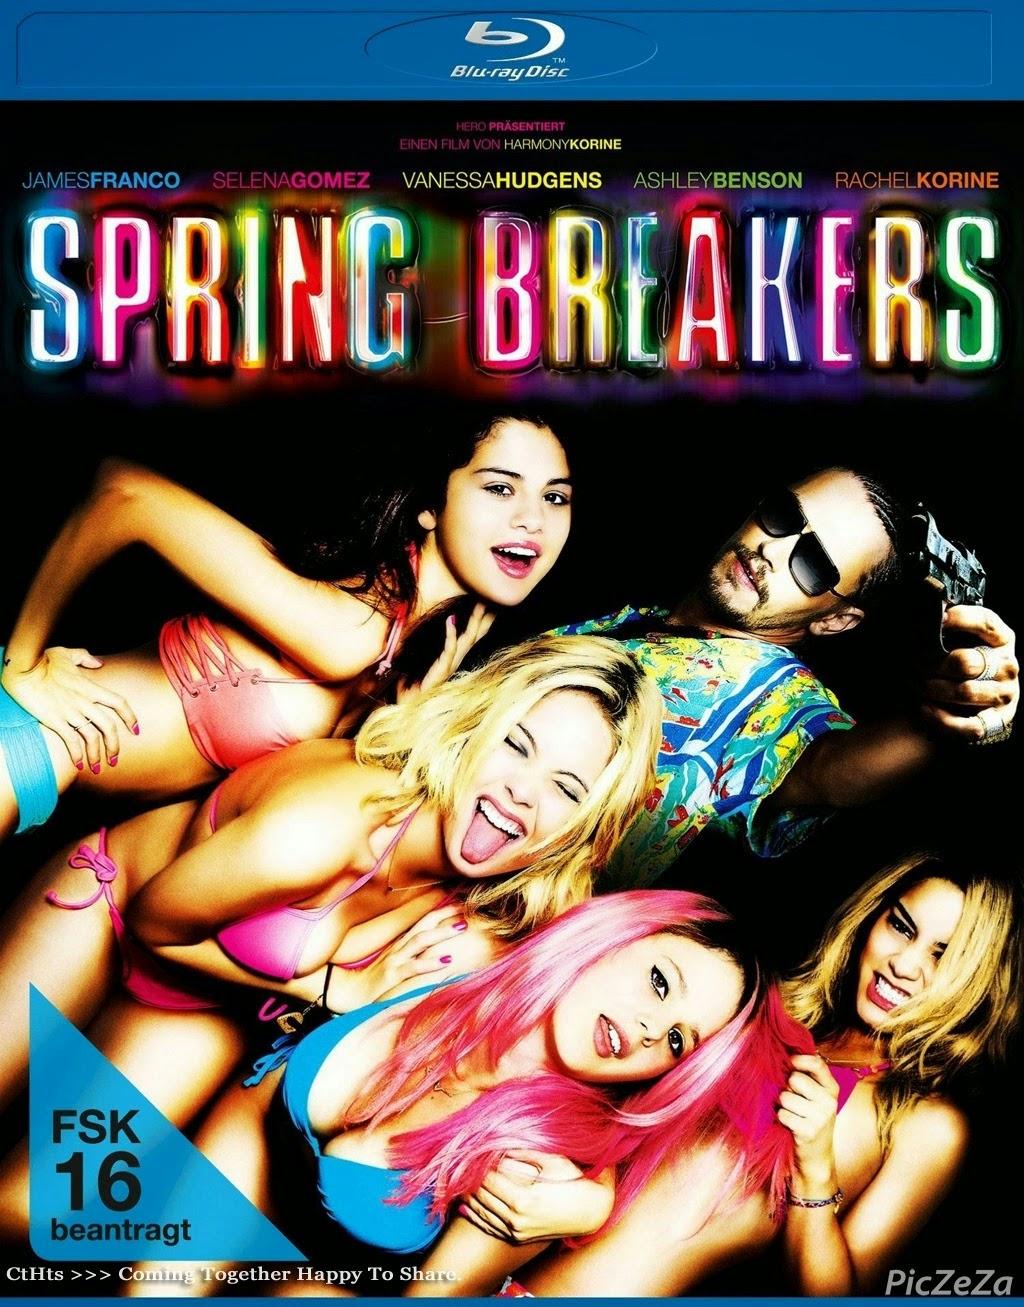 Spring Breakers (2013)  : กิน เที่ยว เปรี้ยว ปล้น